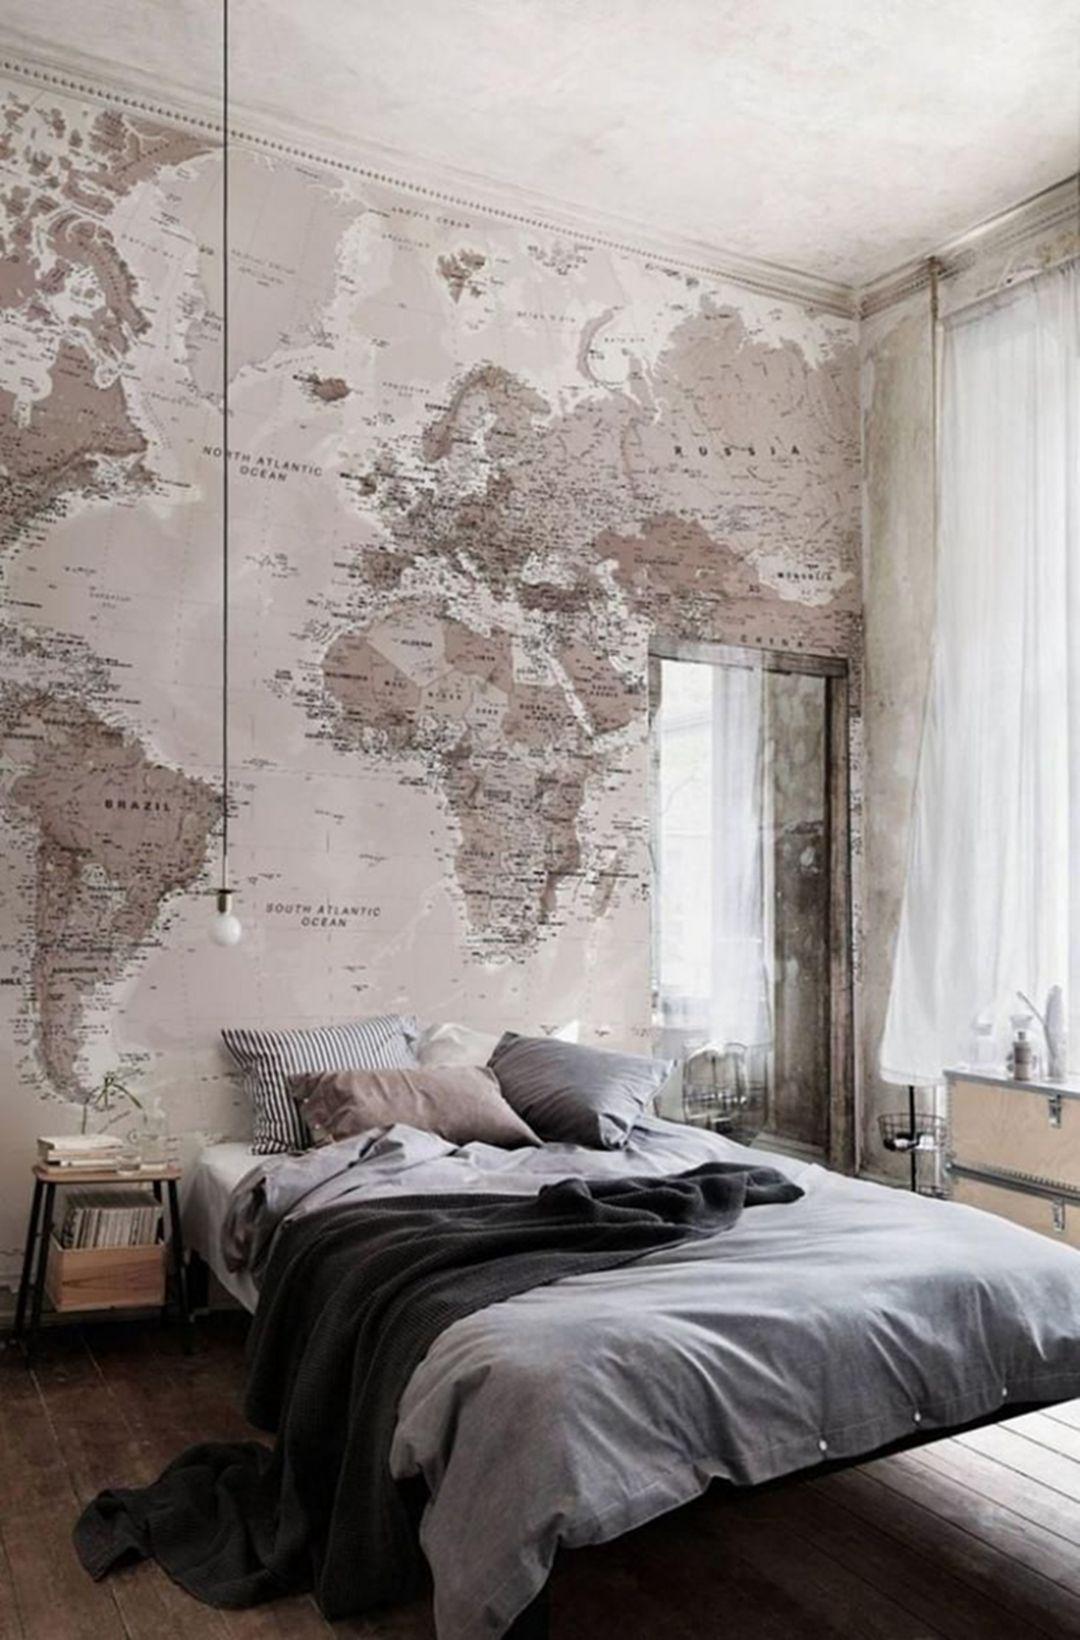 40 Beautiful Bedroom Wallpaper Designs To Enhance Your Beautiful